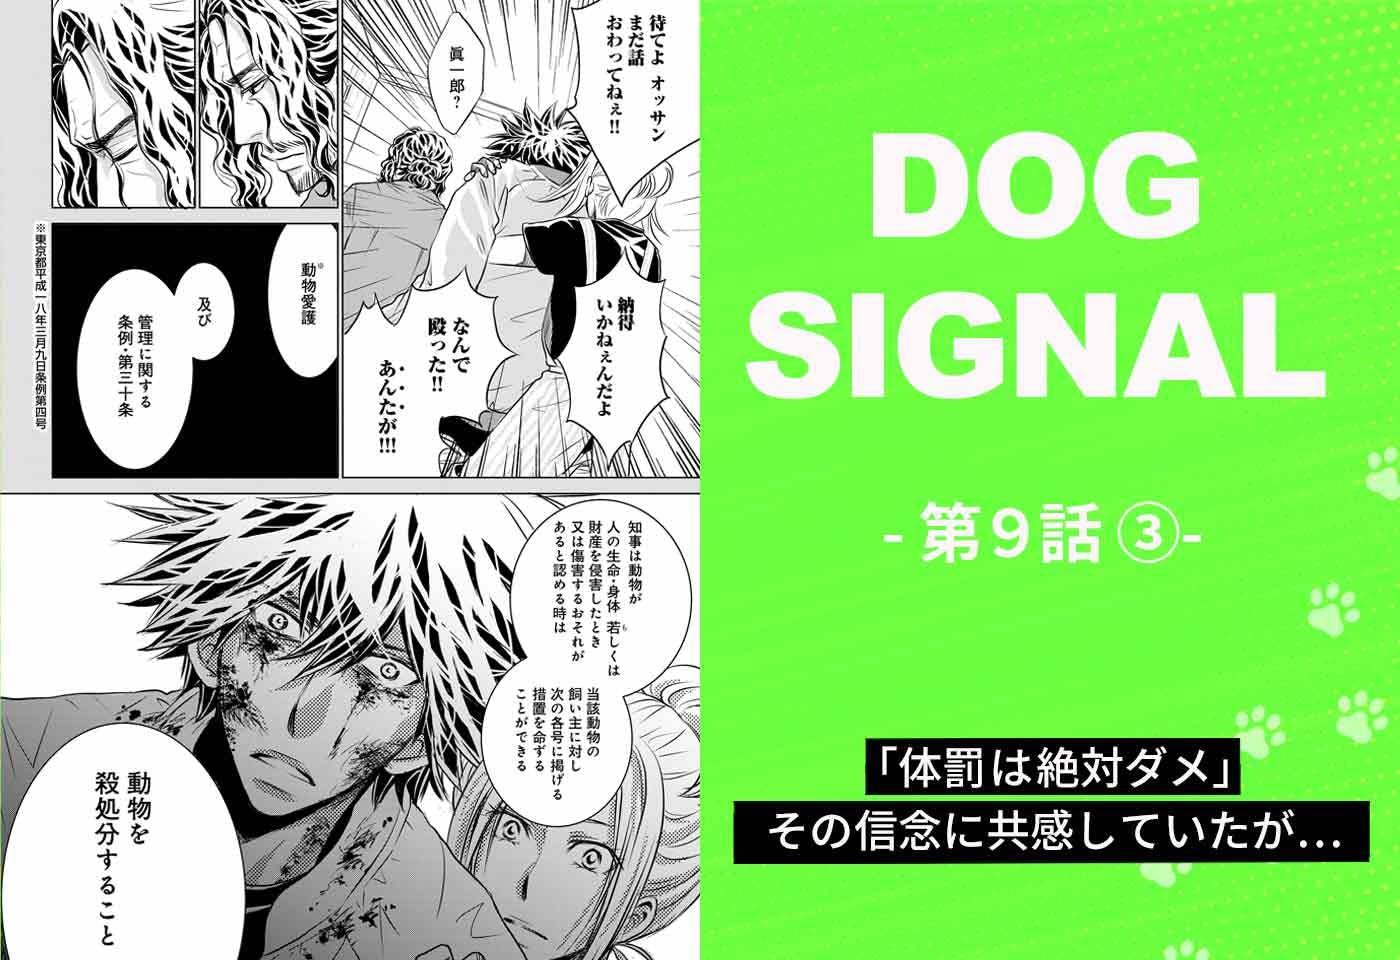 『DOG SIGNAL』9話目 3/4